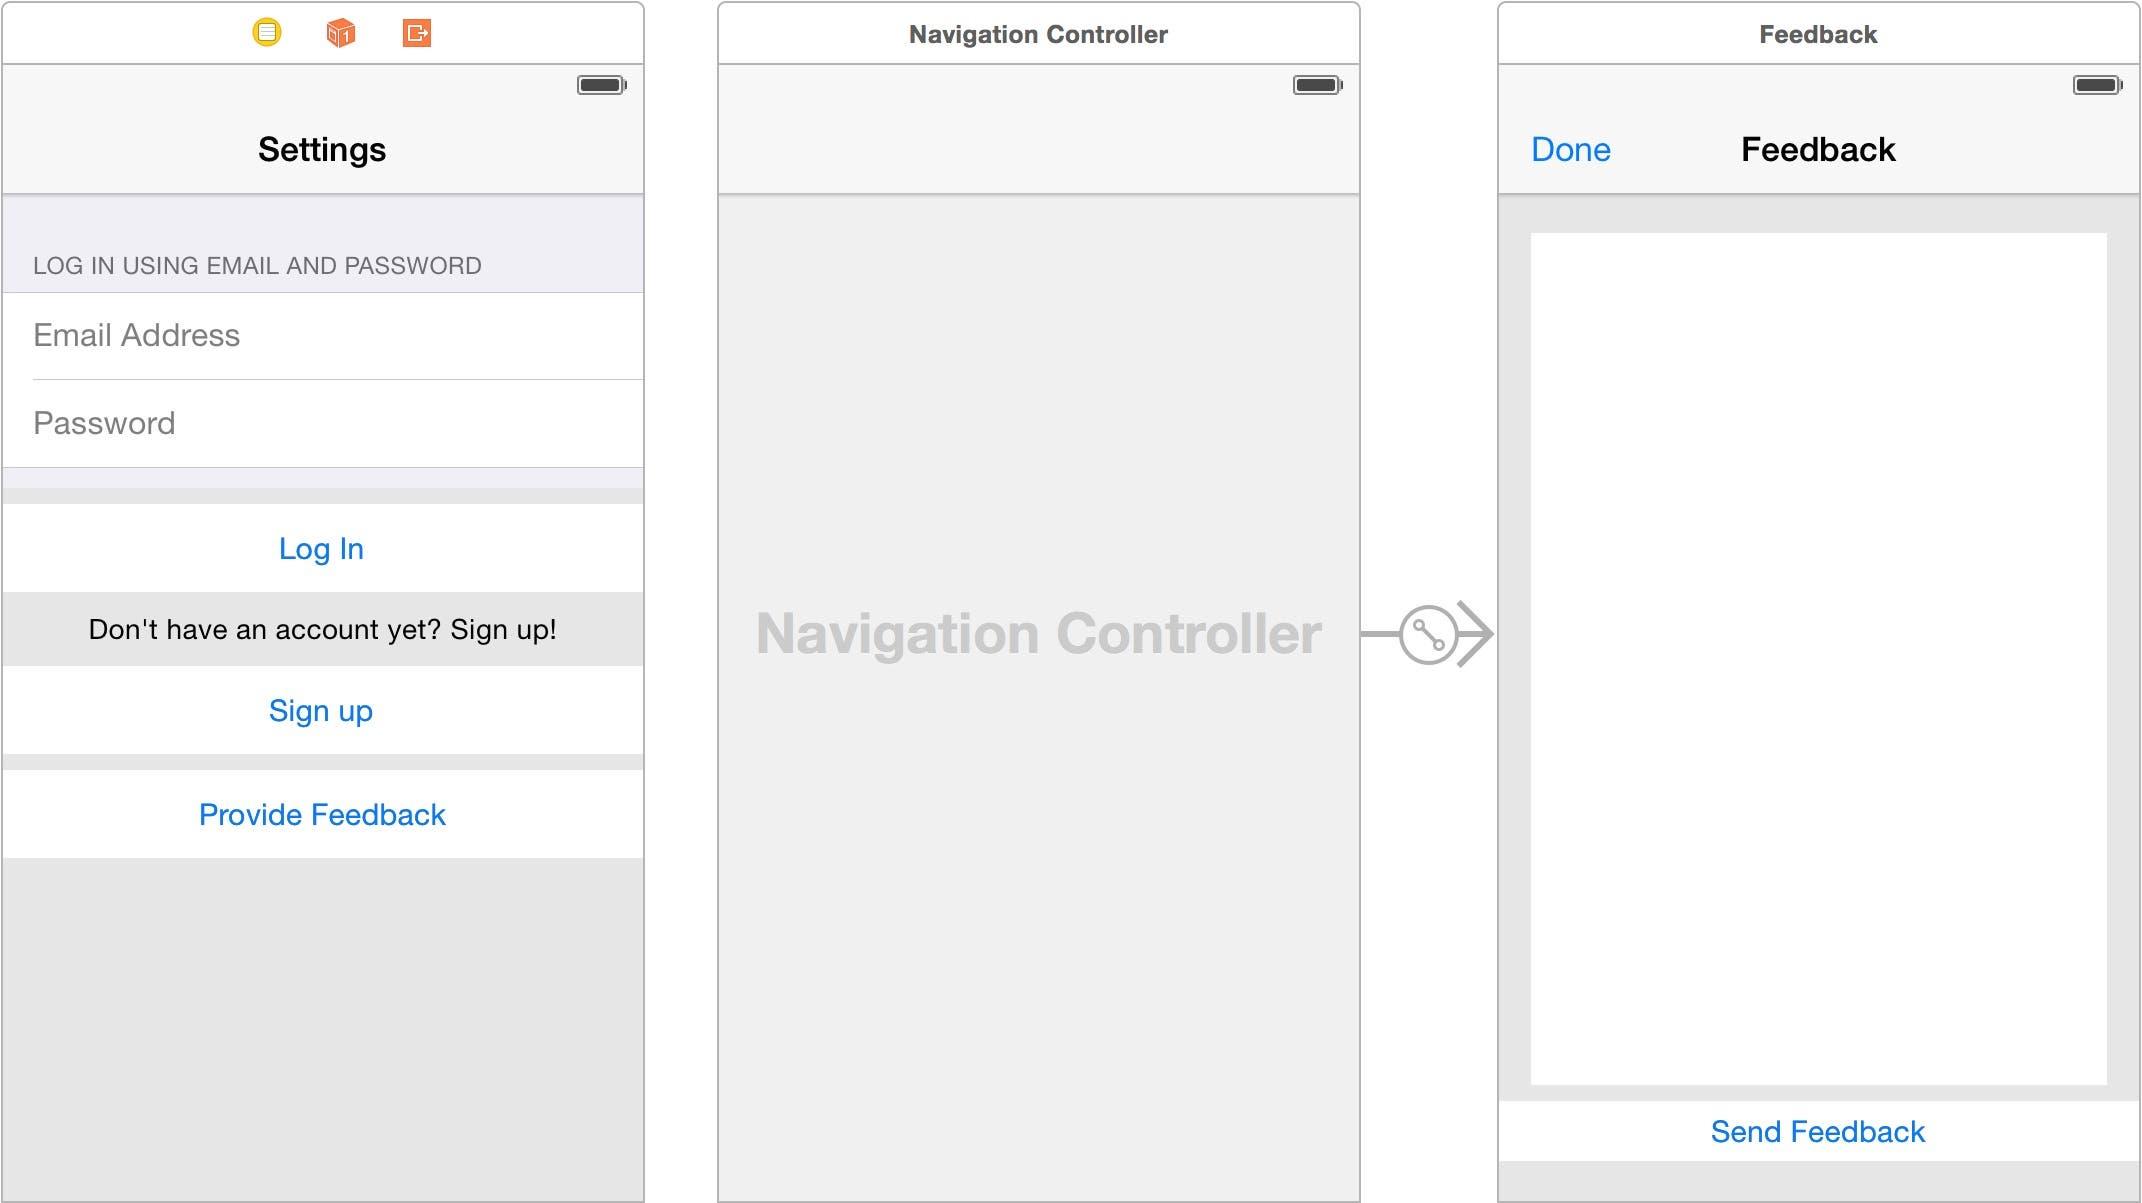 Embed Feedback scene in a navigation controller